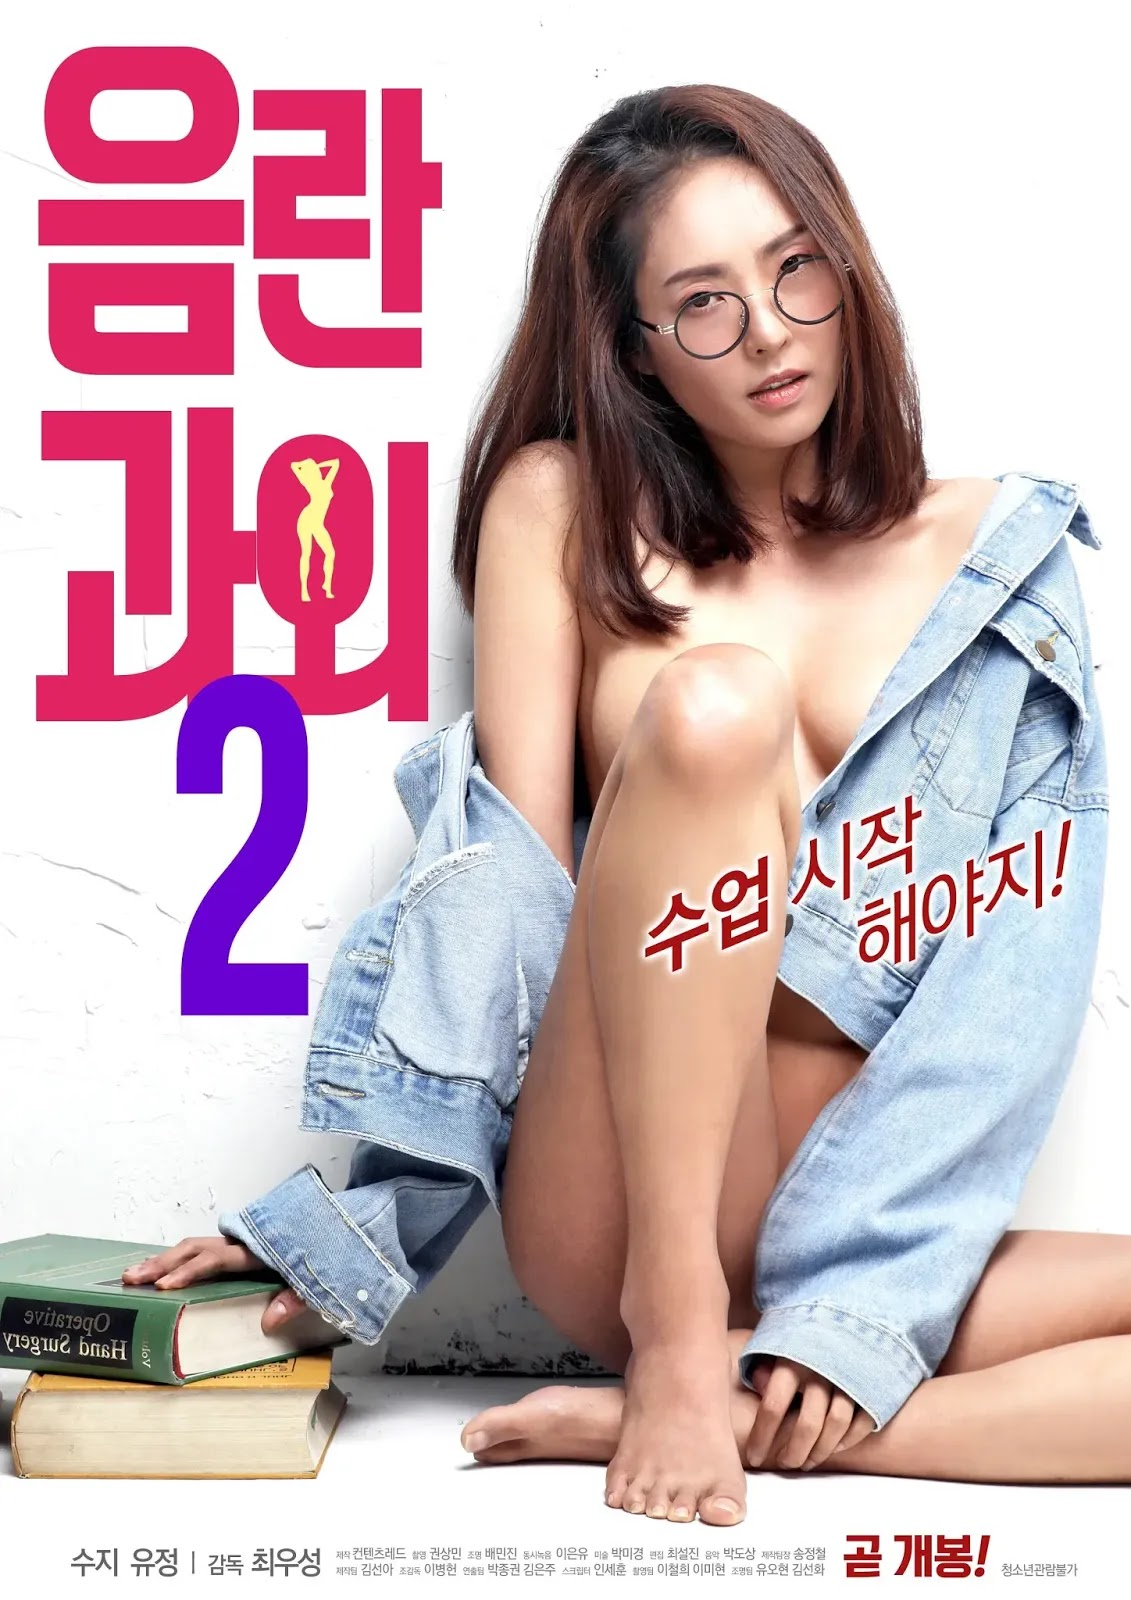 Erotic Tutoring 2 Full Korea 18+ Adult Movie Online Free